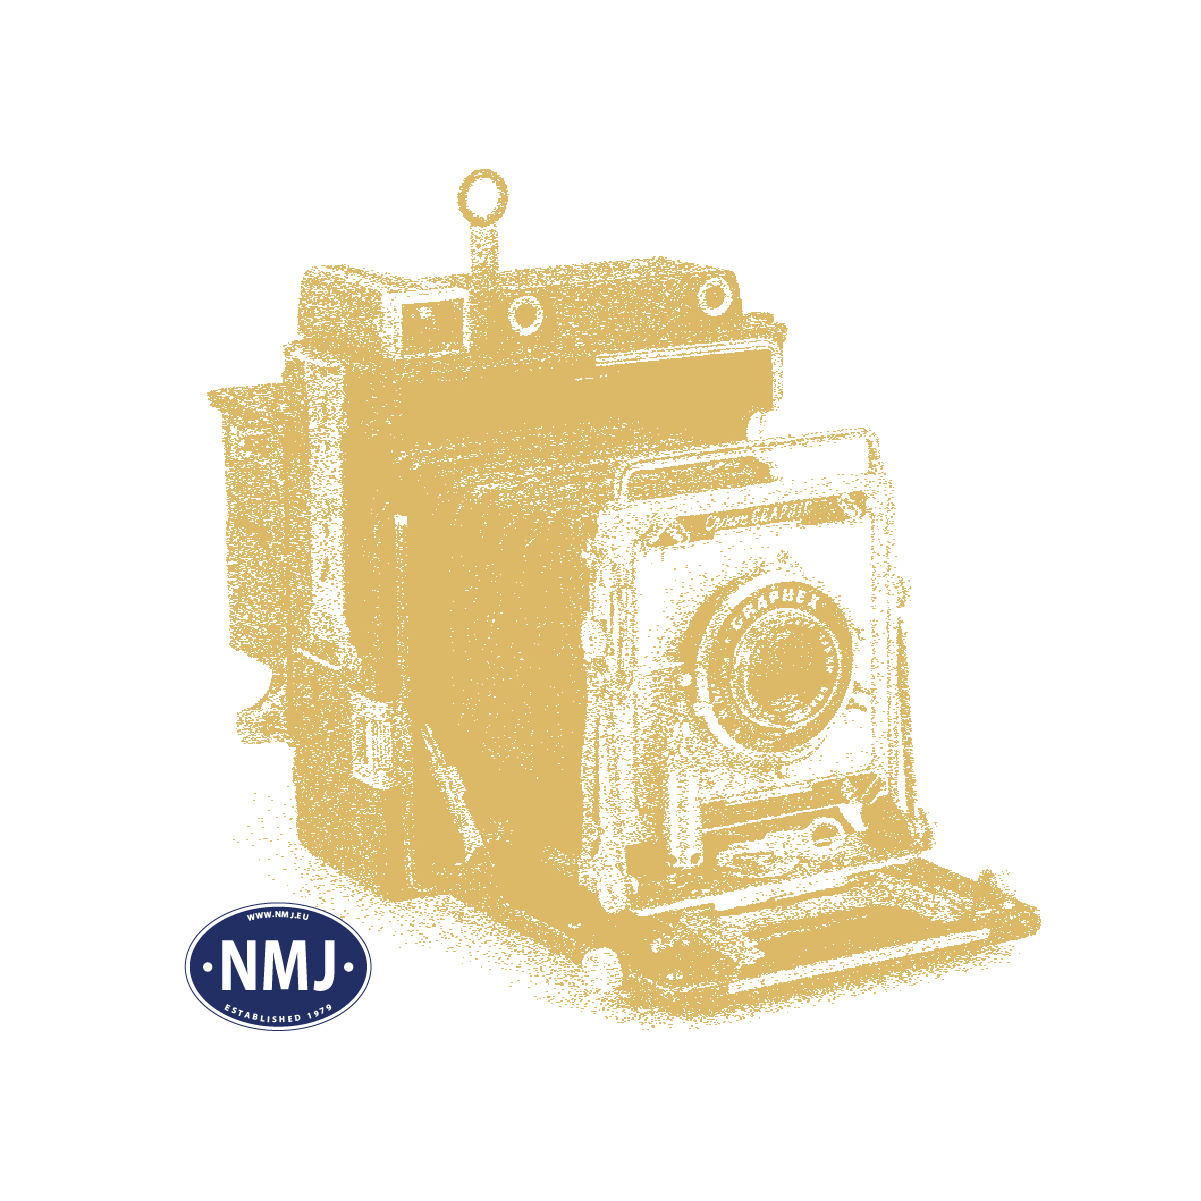 NMJT599.104 - *NMJ Exclusive* Scania Vabis LB76 Hängerzug, Findus Dypfryste produkter